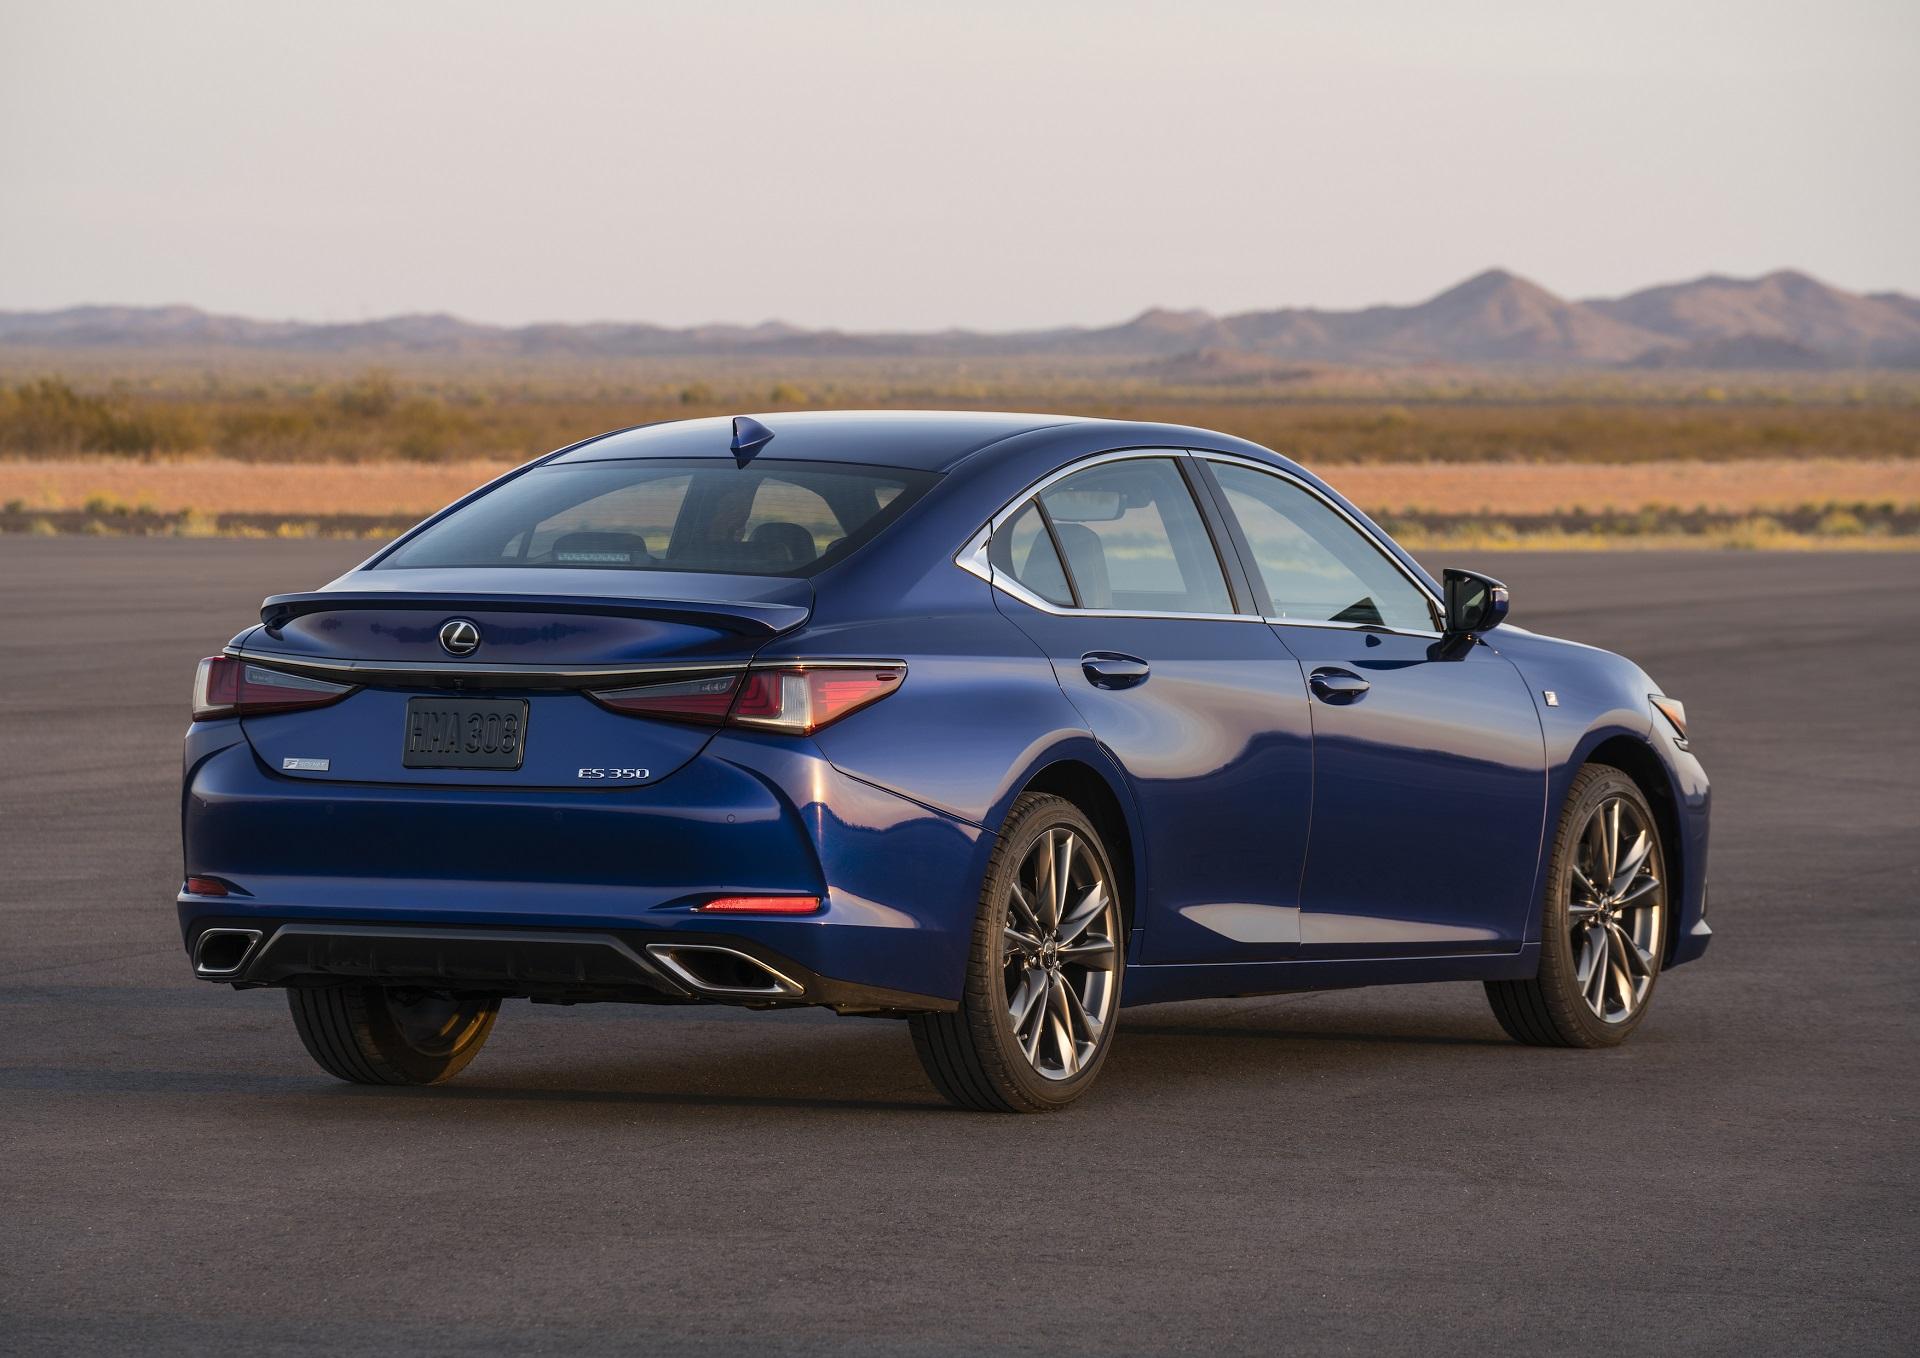 The New Lexus ES s F Sport Trim Adds a Sportier Look Adaptive